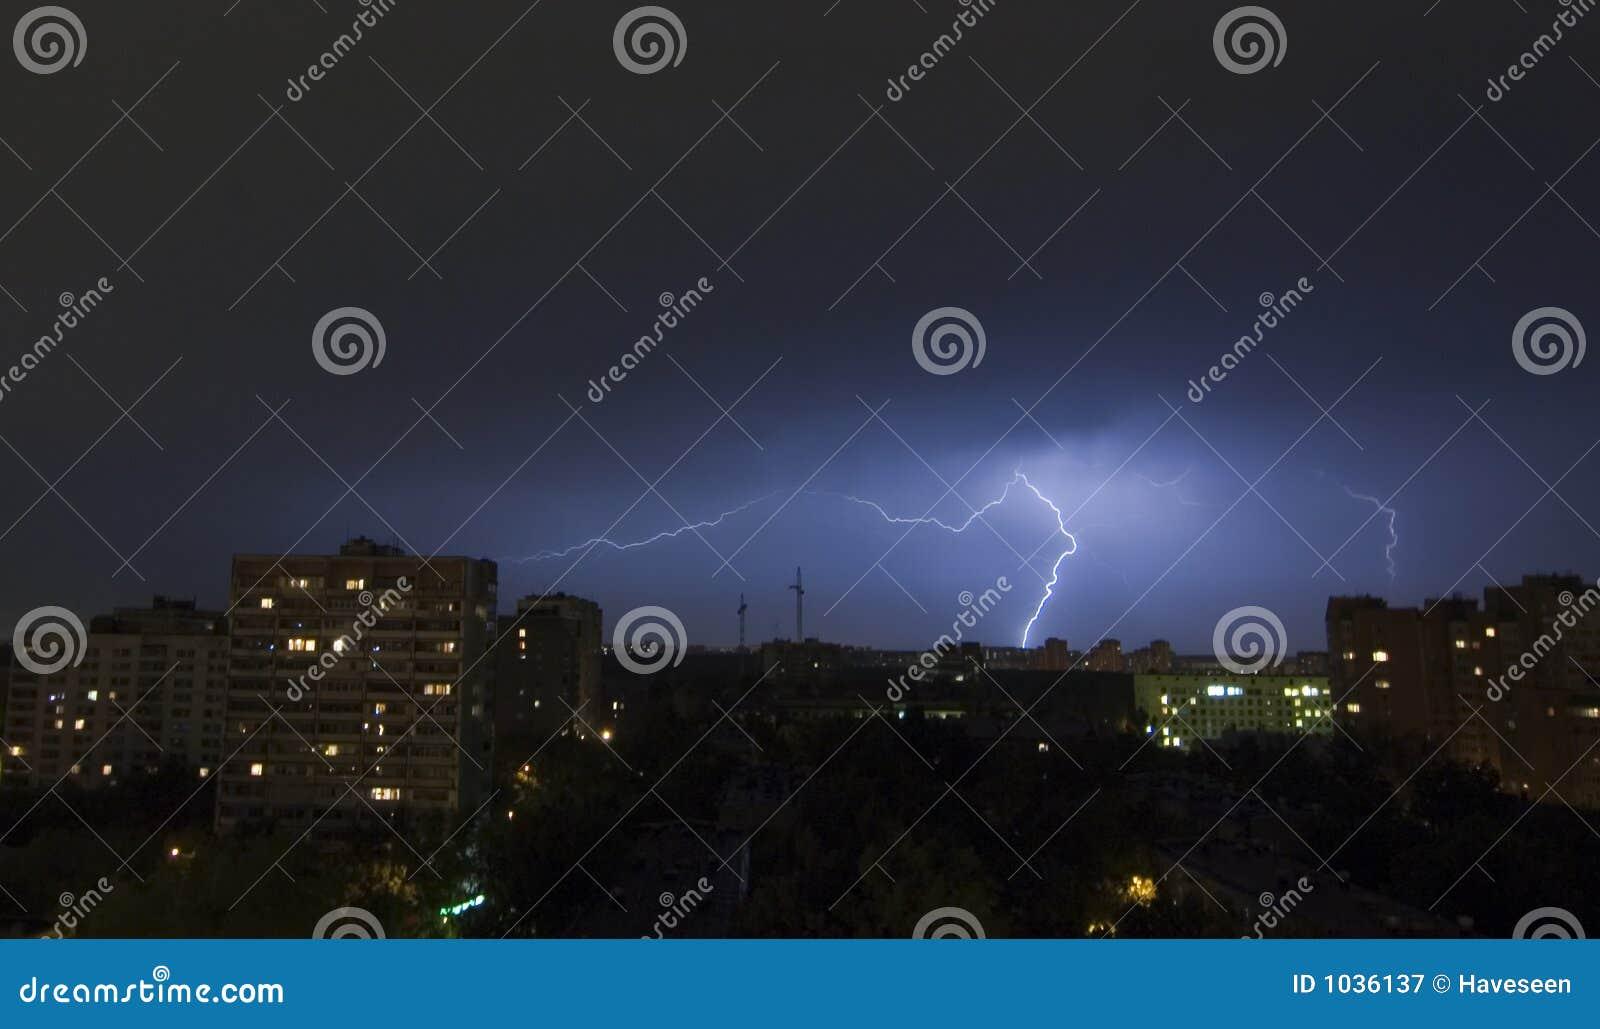 Lightning in City